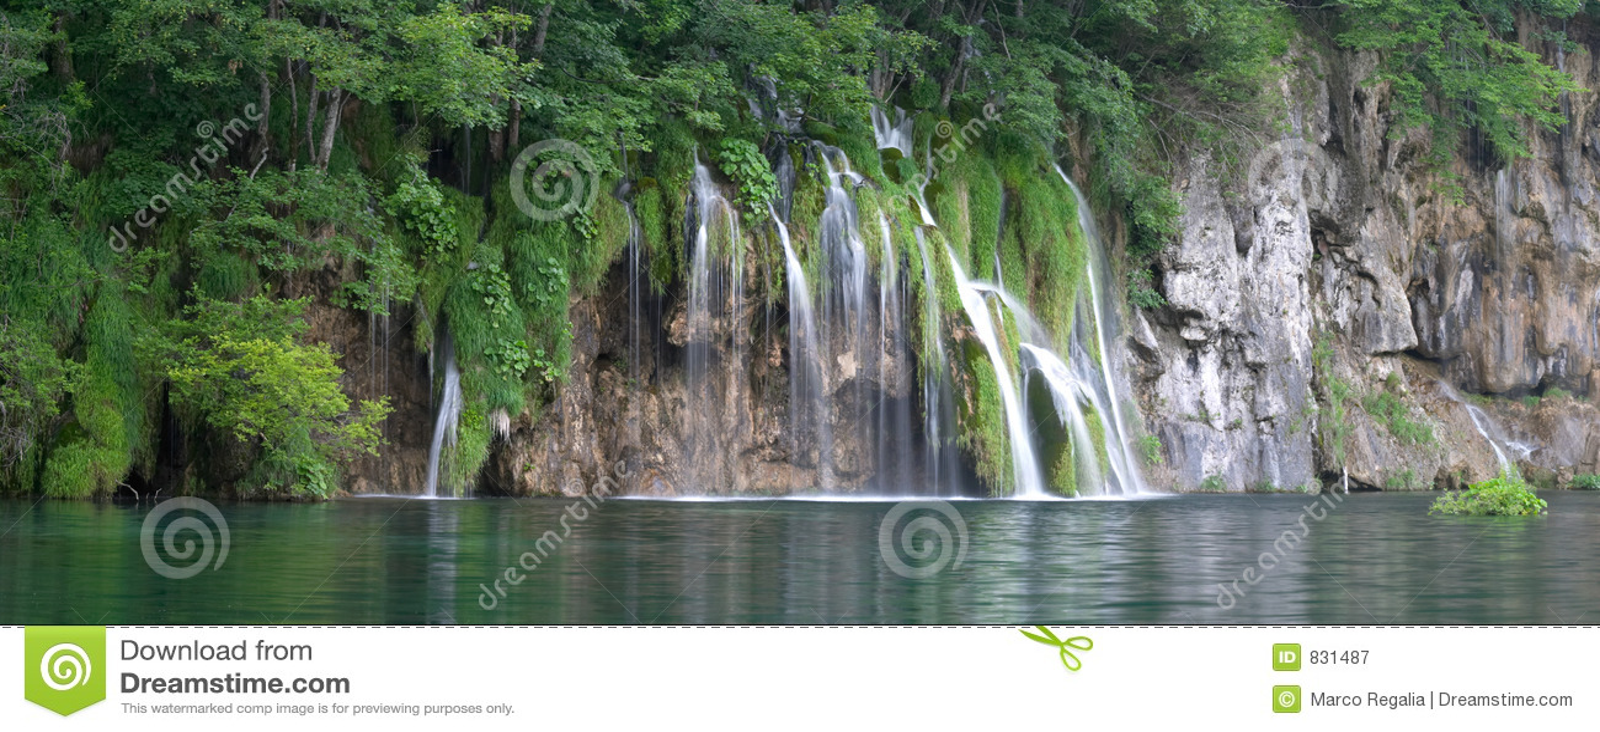 Waterfall in Plitvice lake (Plitvicka jezera)